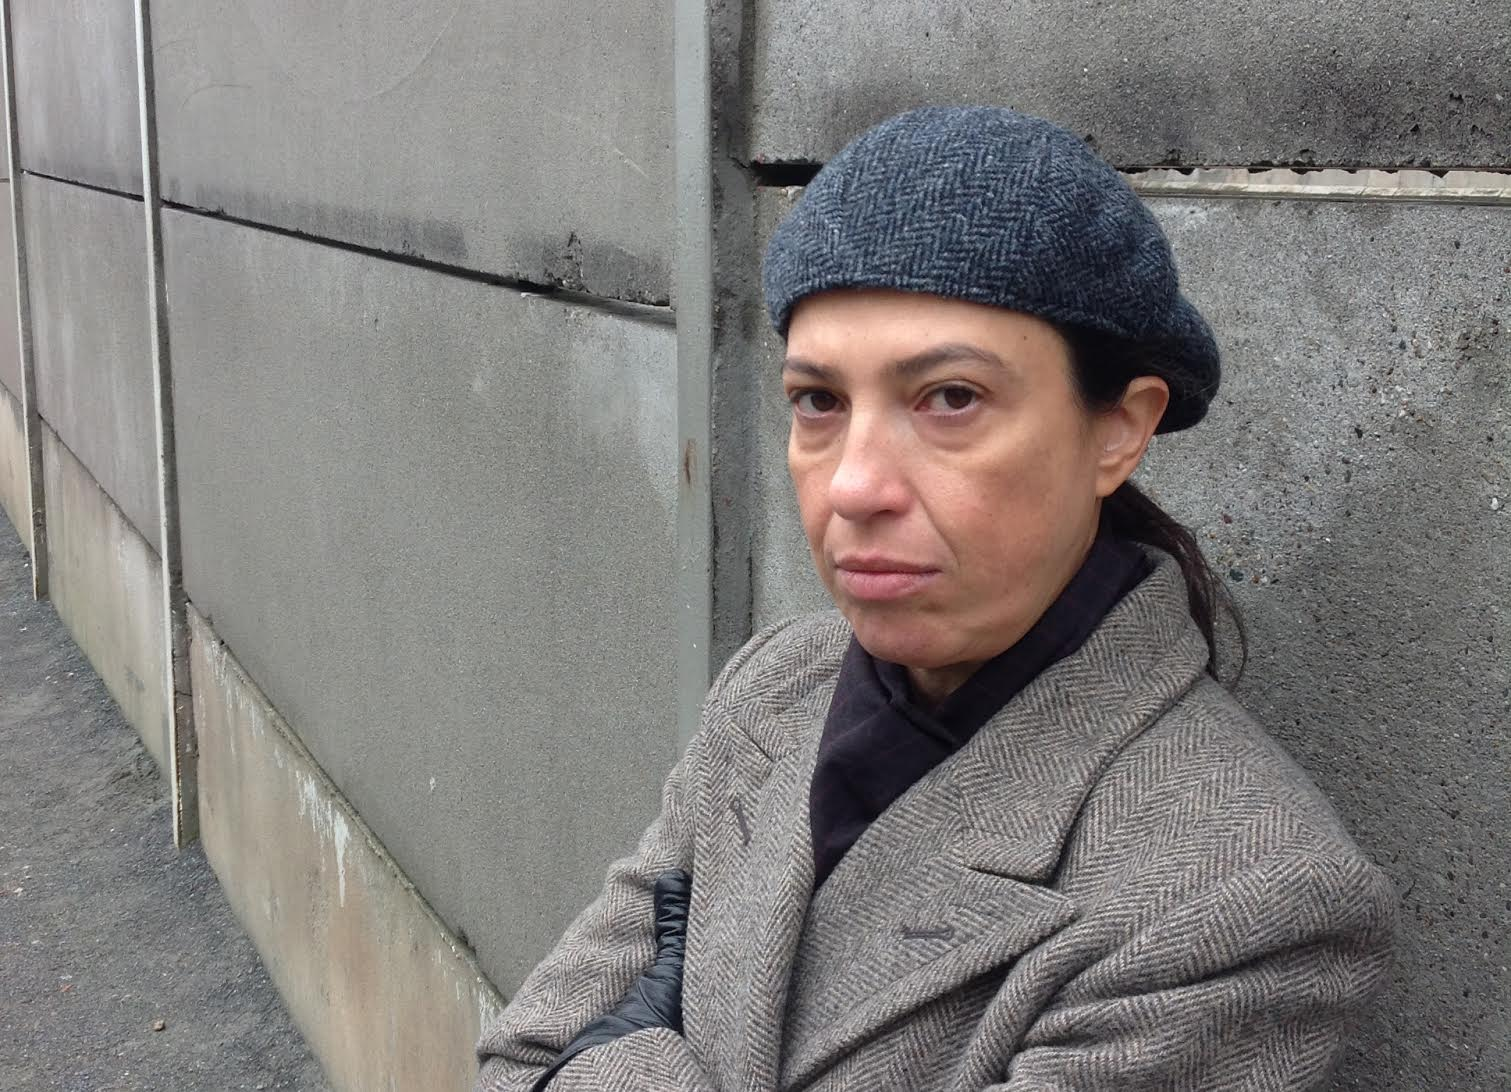 Alessandra Novaga